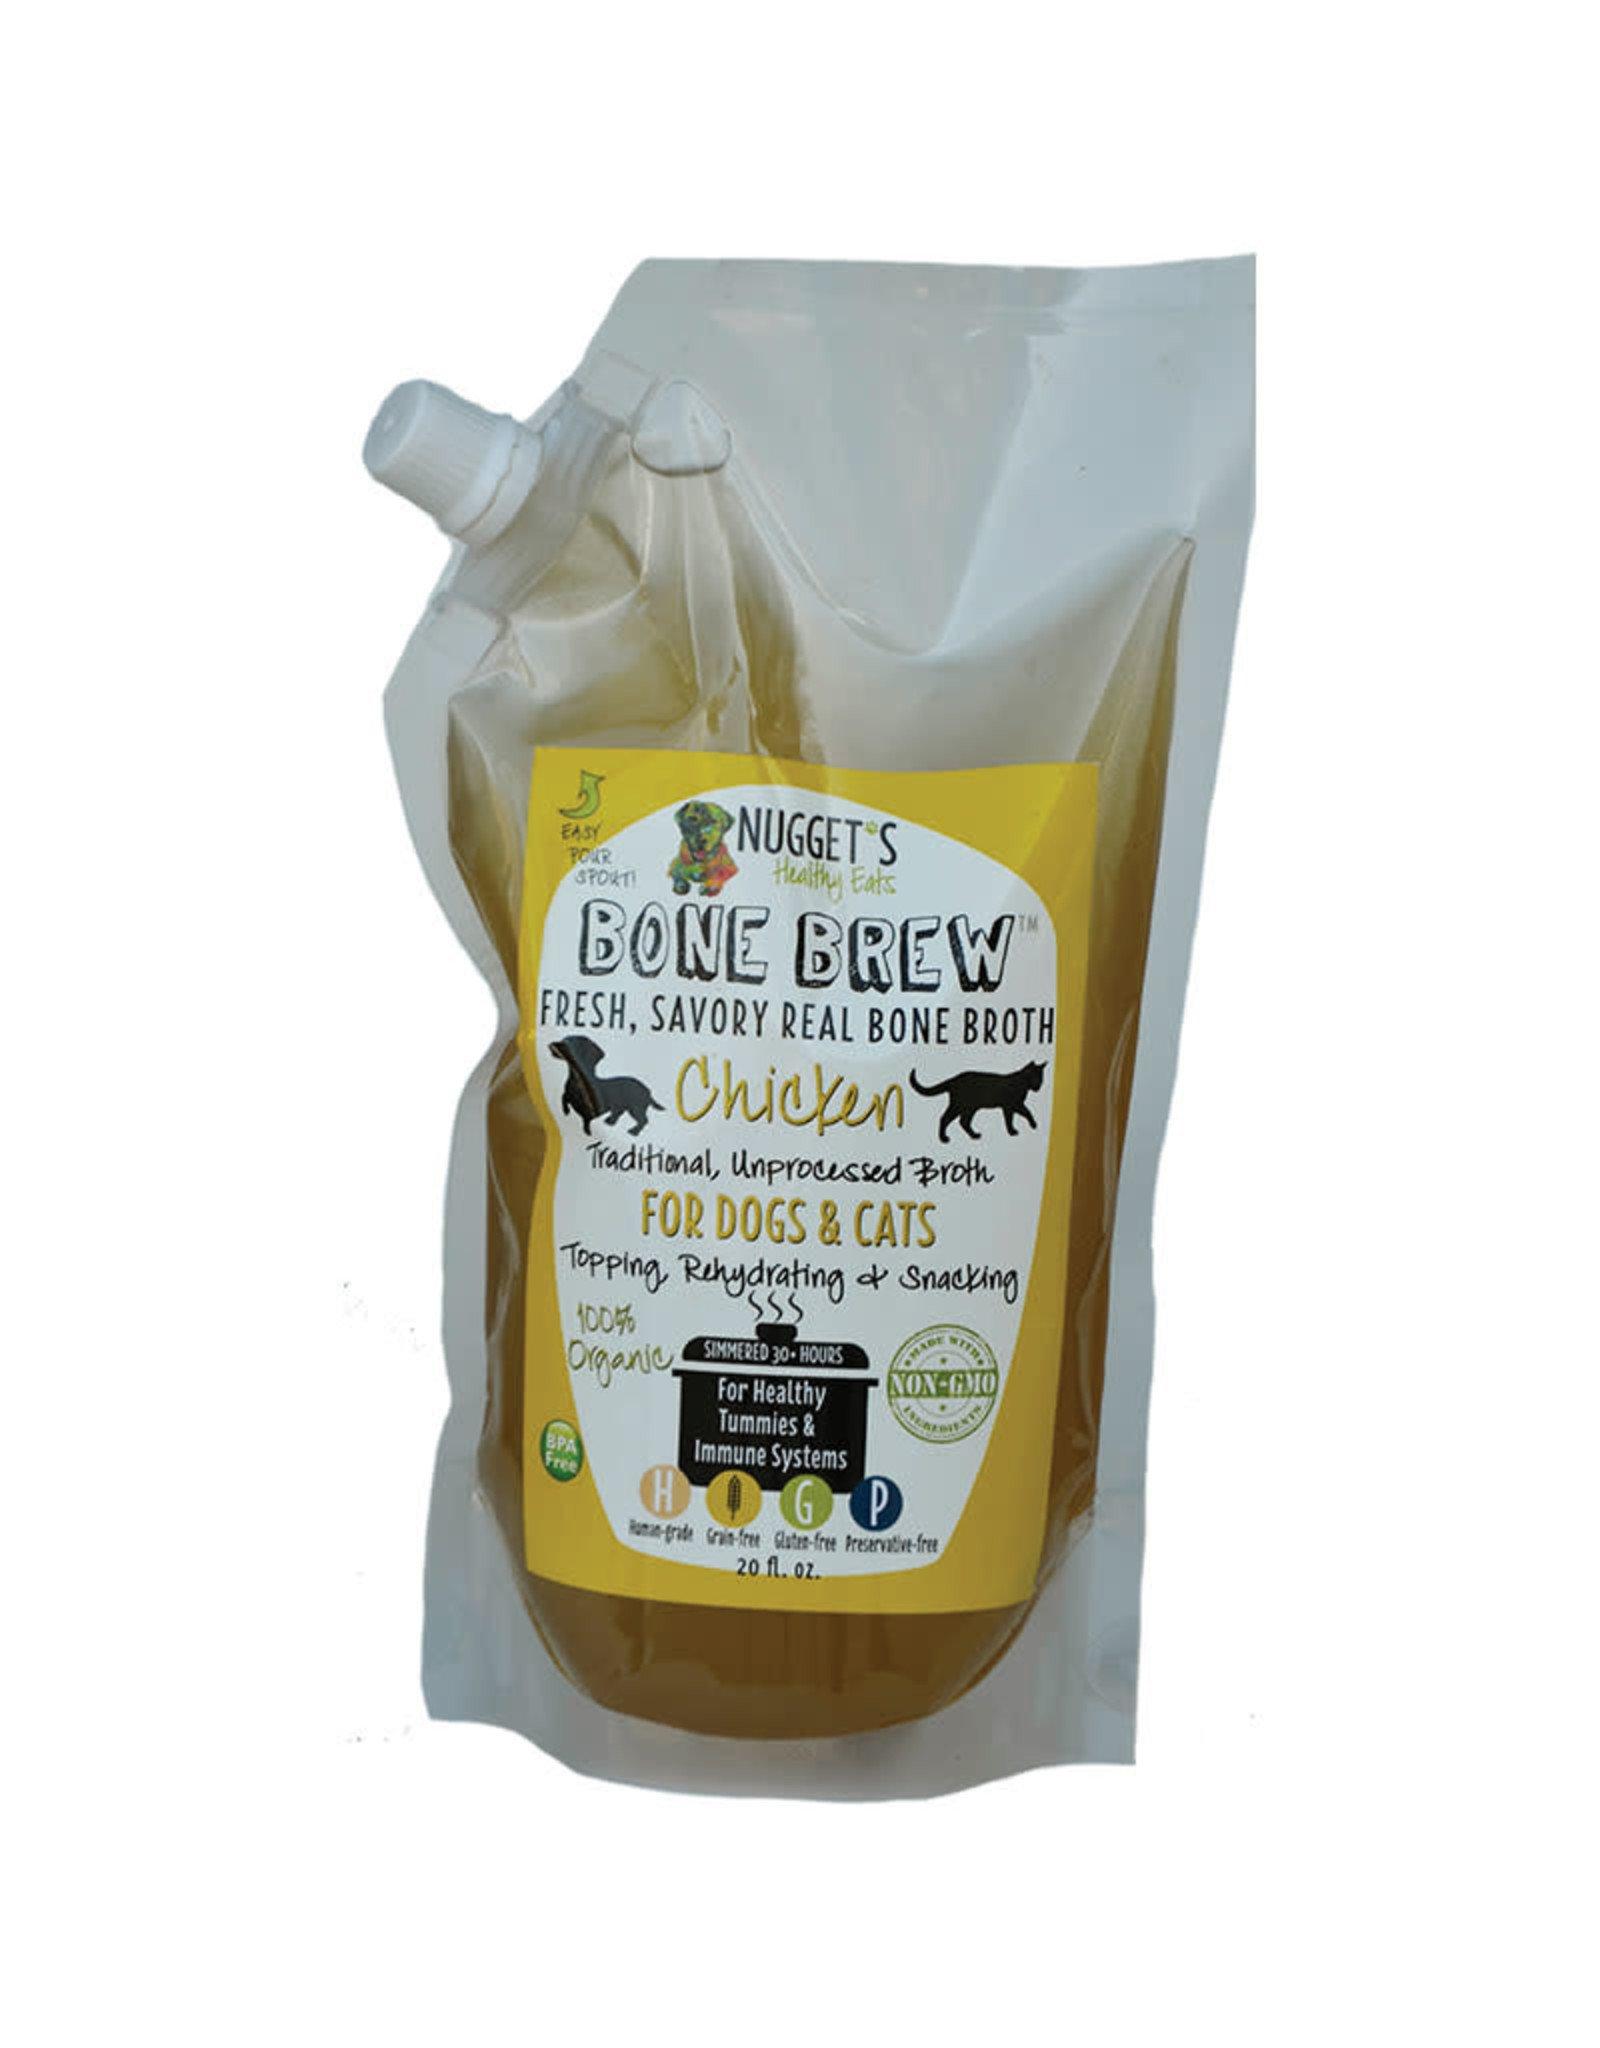 Nuggets Healthy Eats Nuggets Healthy Eats Bone Brew Chicken Bone Broth for Dogs & Cats 20oz